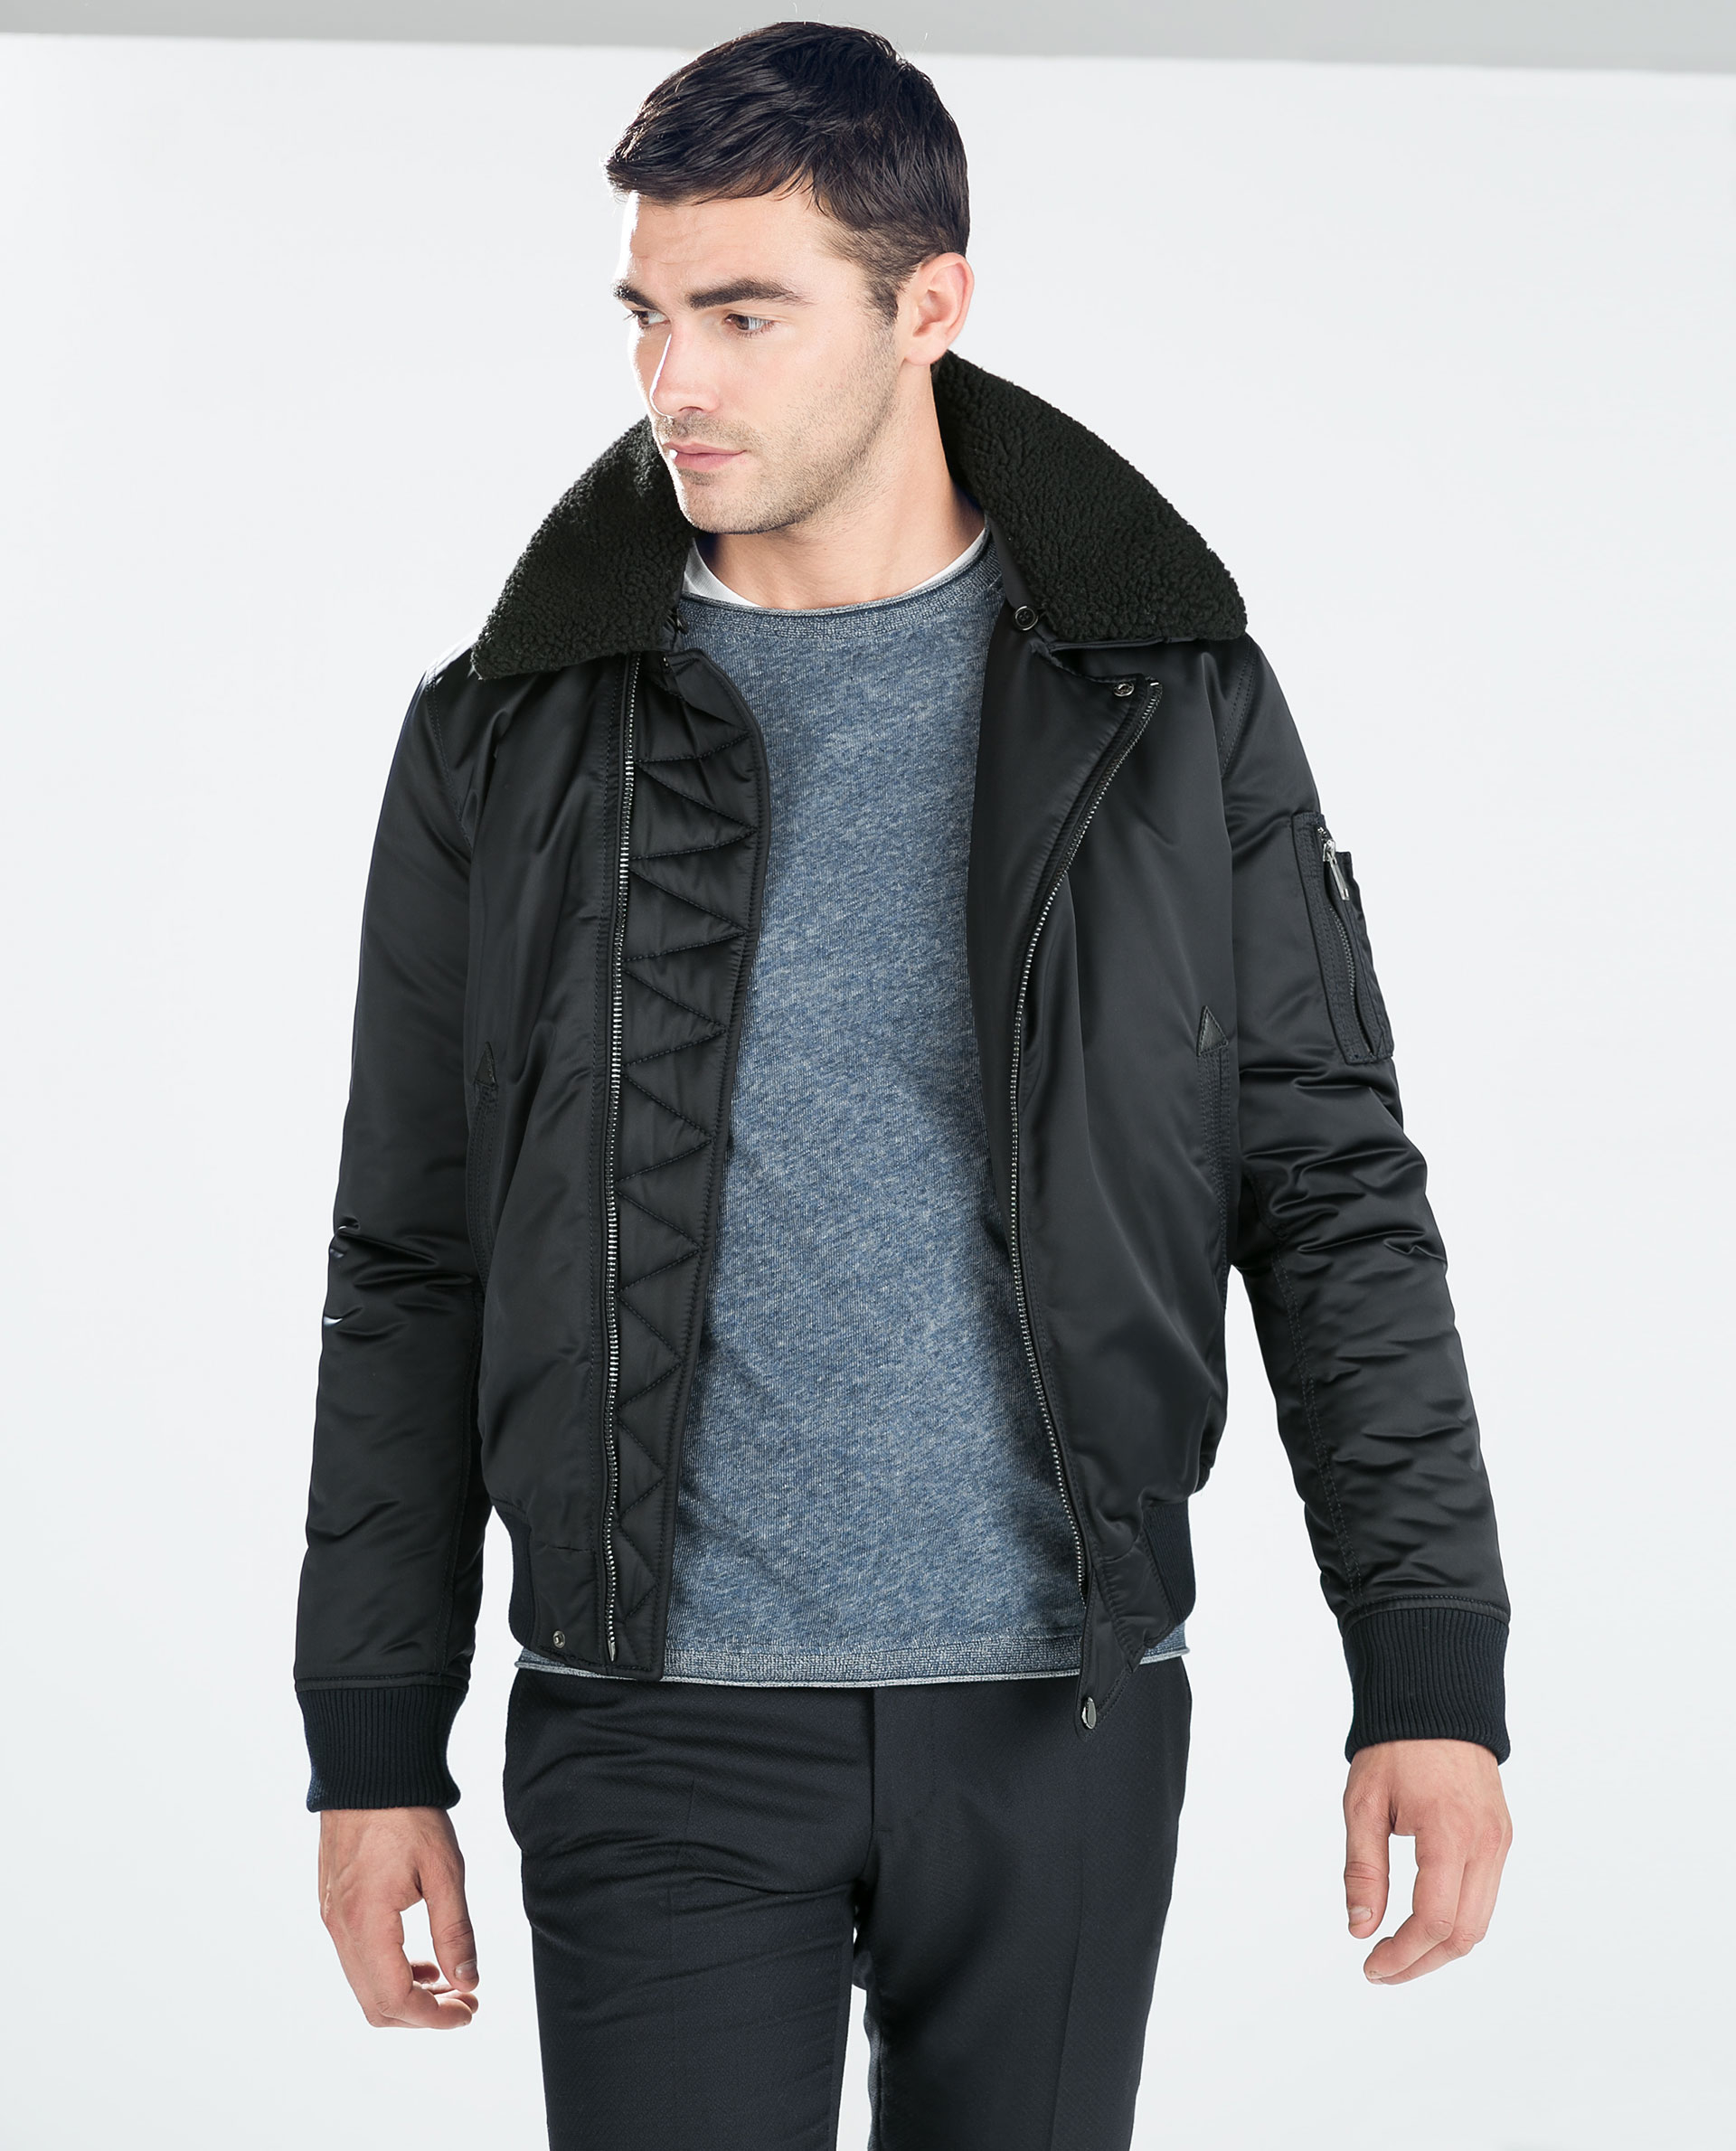 Zara Jacket With Fur Collar in Blue for Men | Lyst